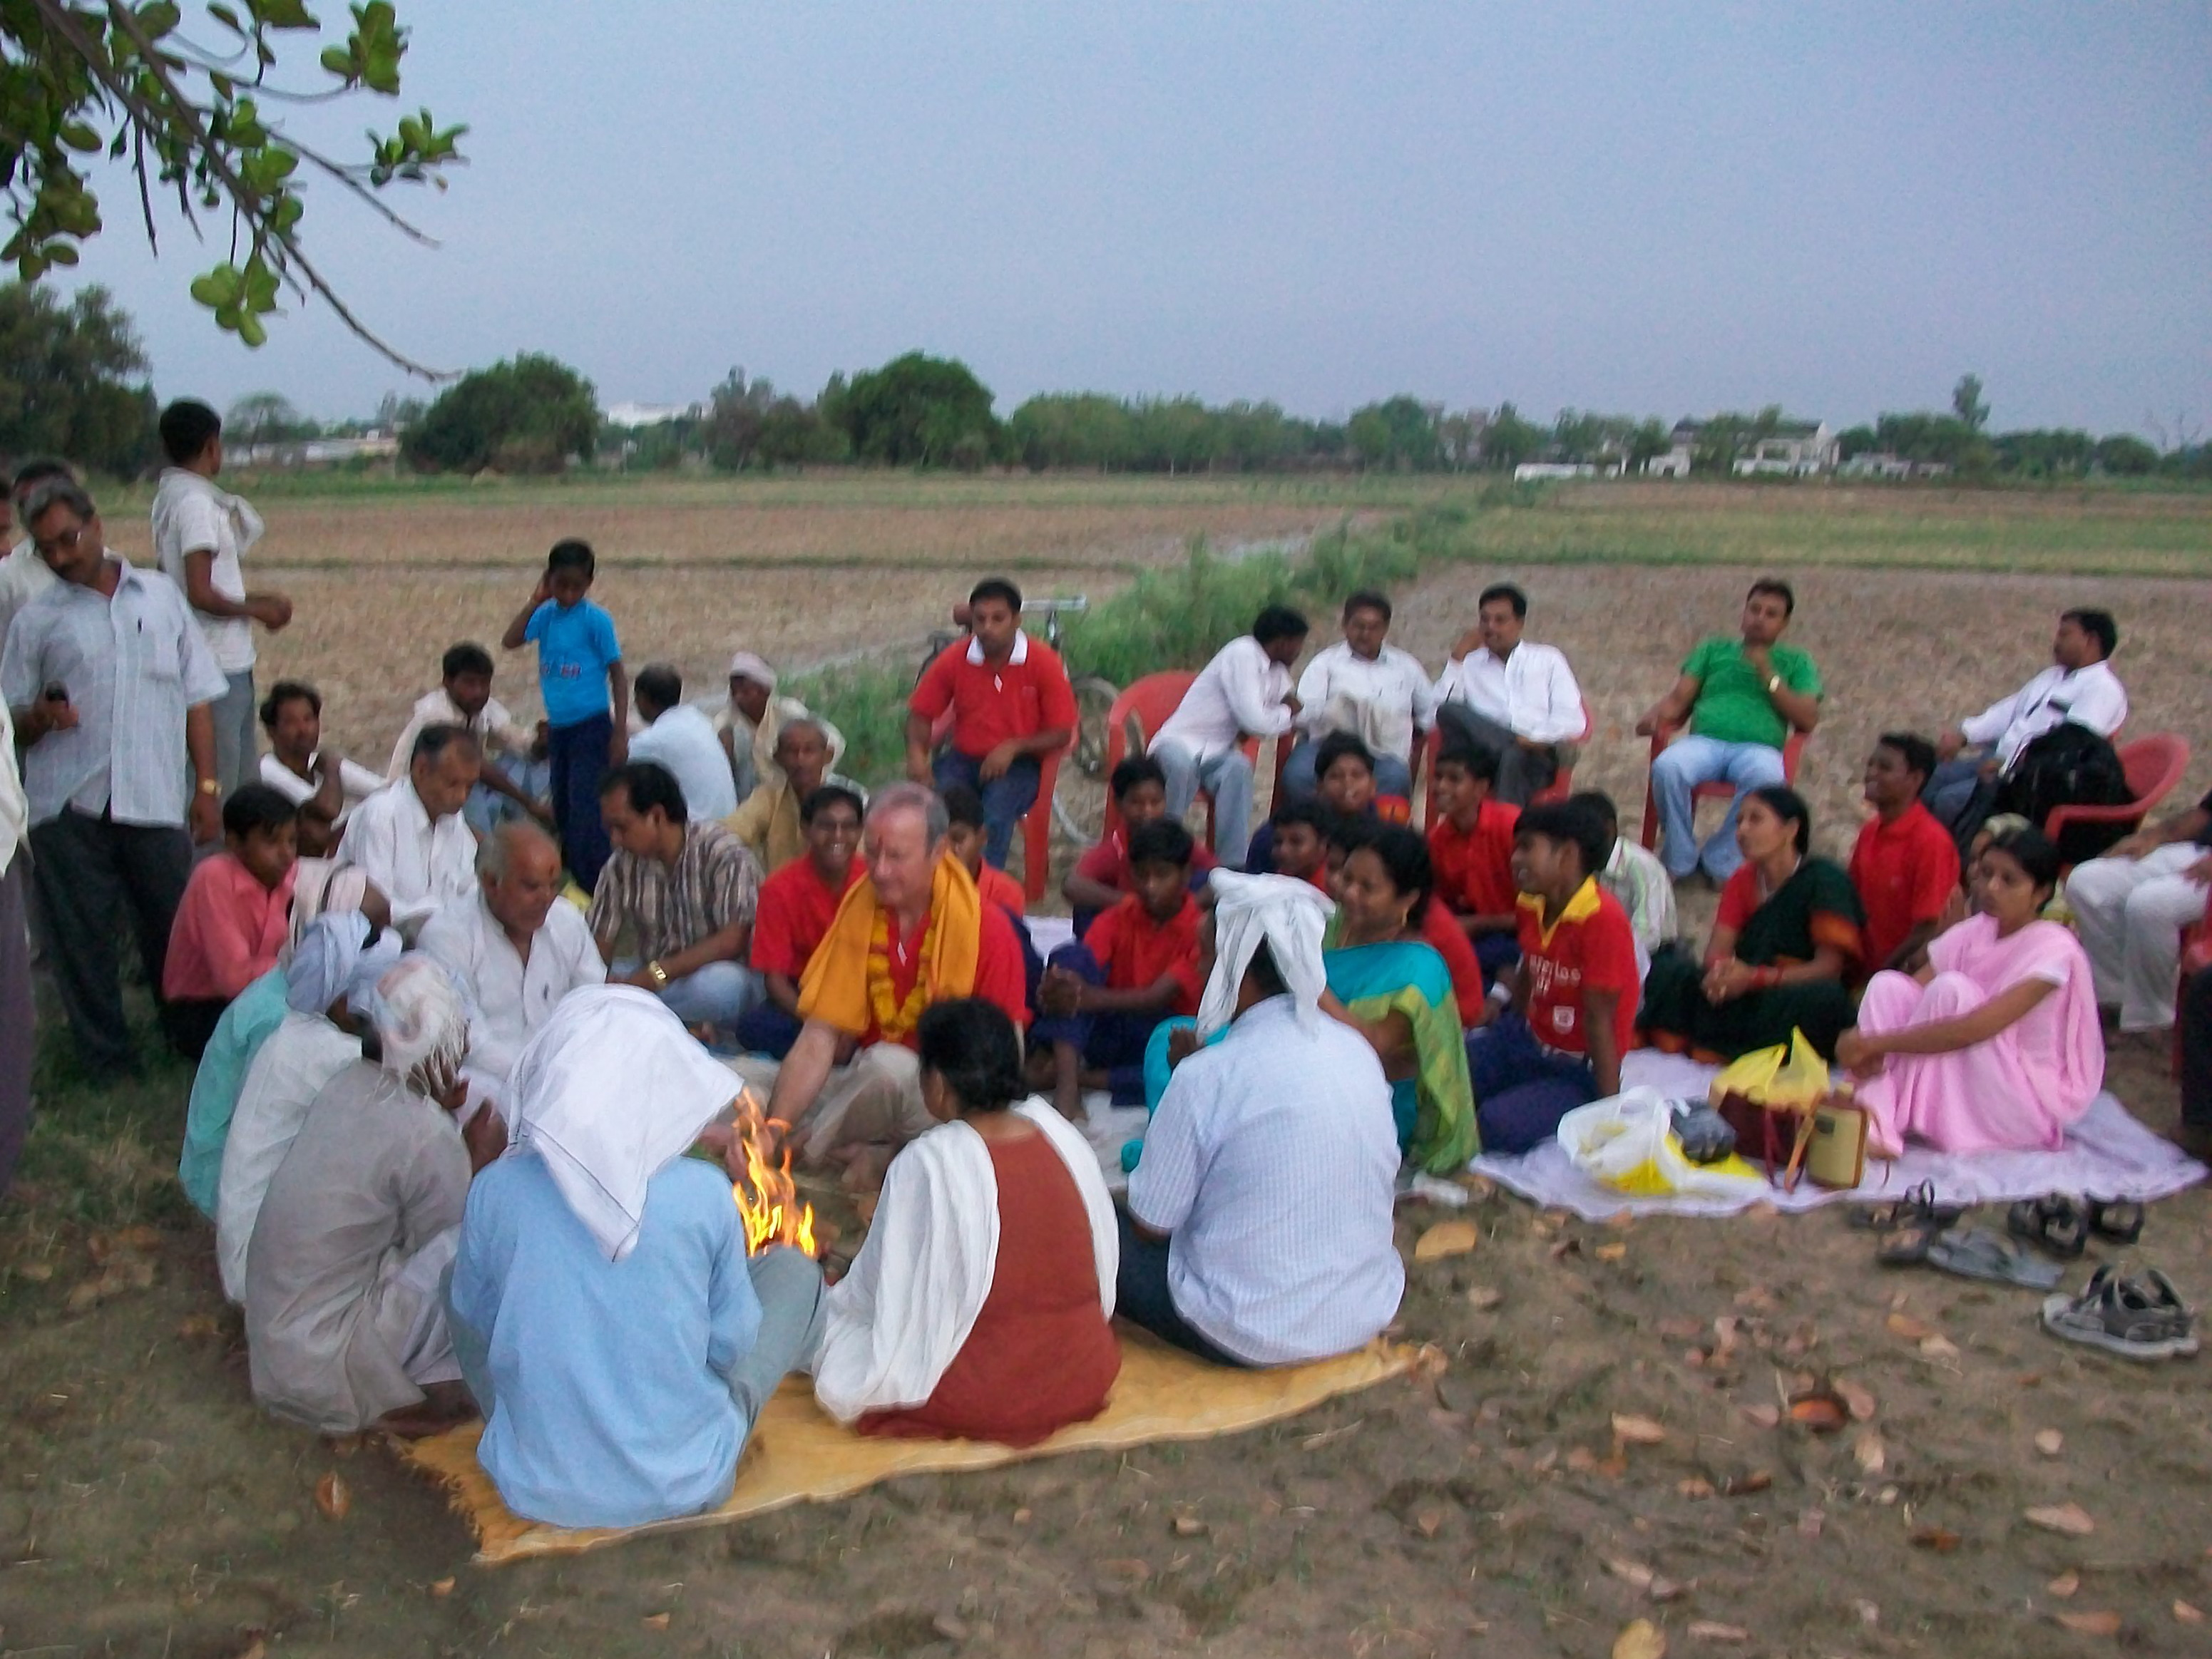 Mala india 06 07 2010 bhumi puja ou la b n diction de for Mala india magasin waterloo